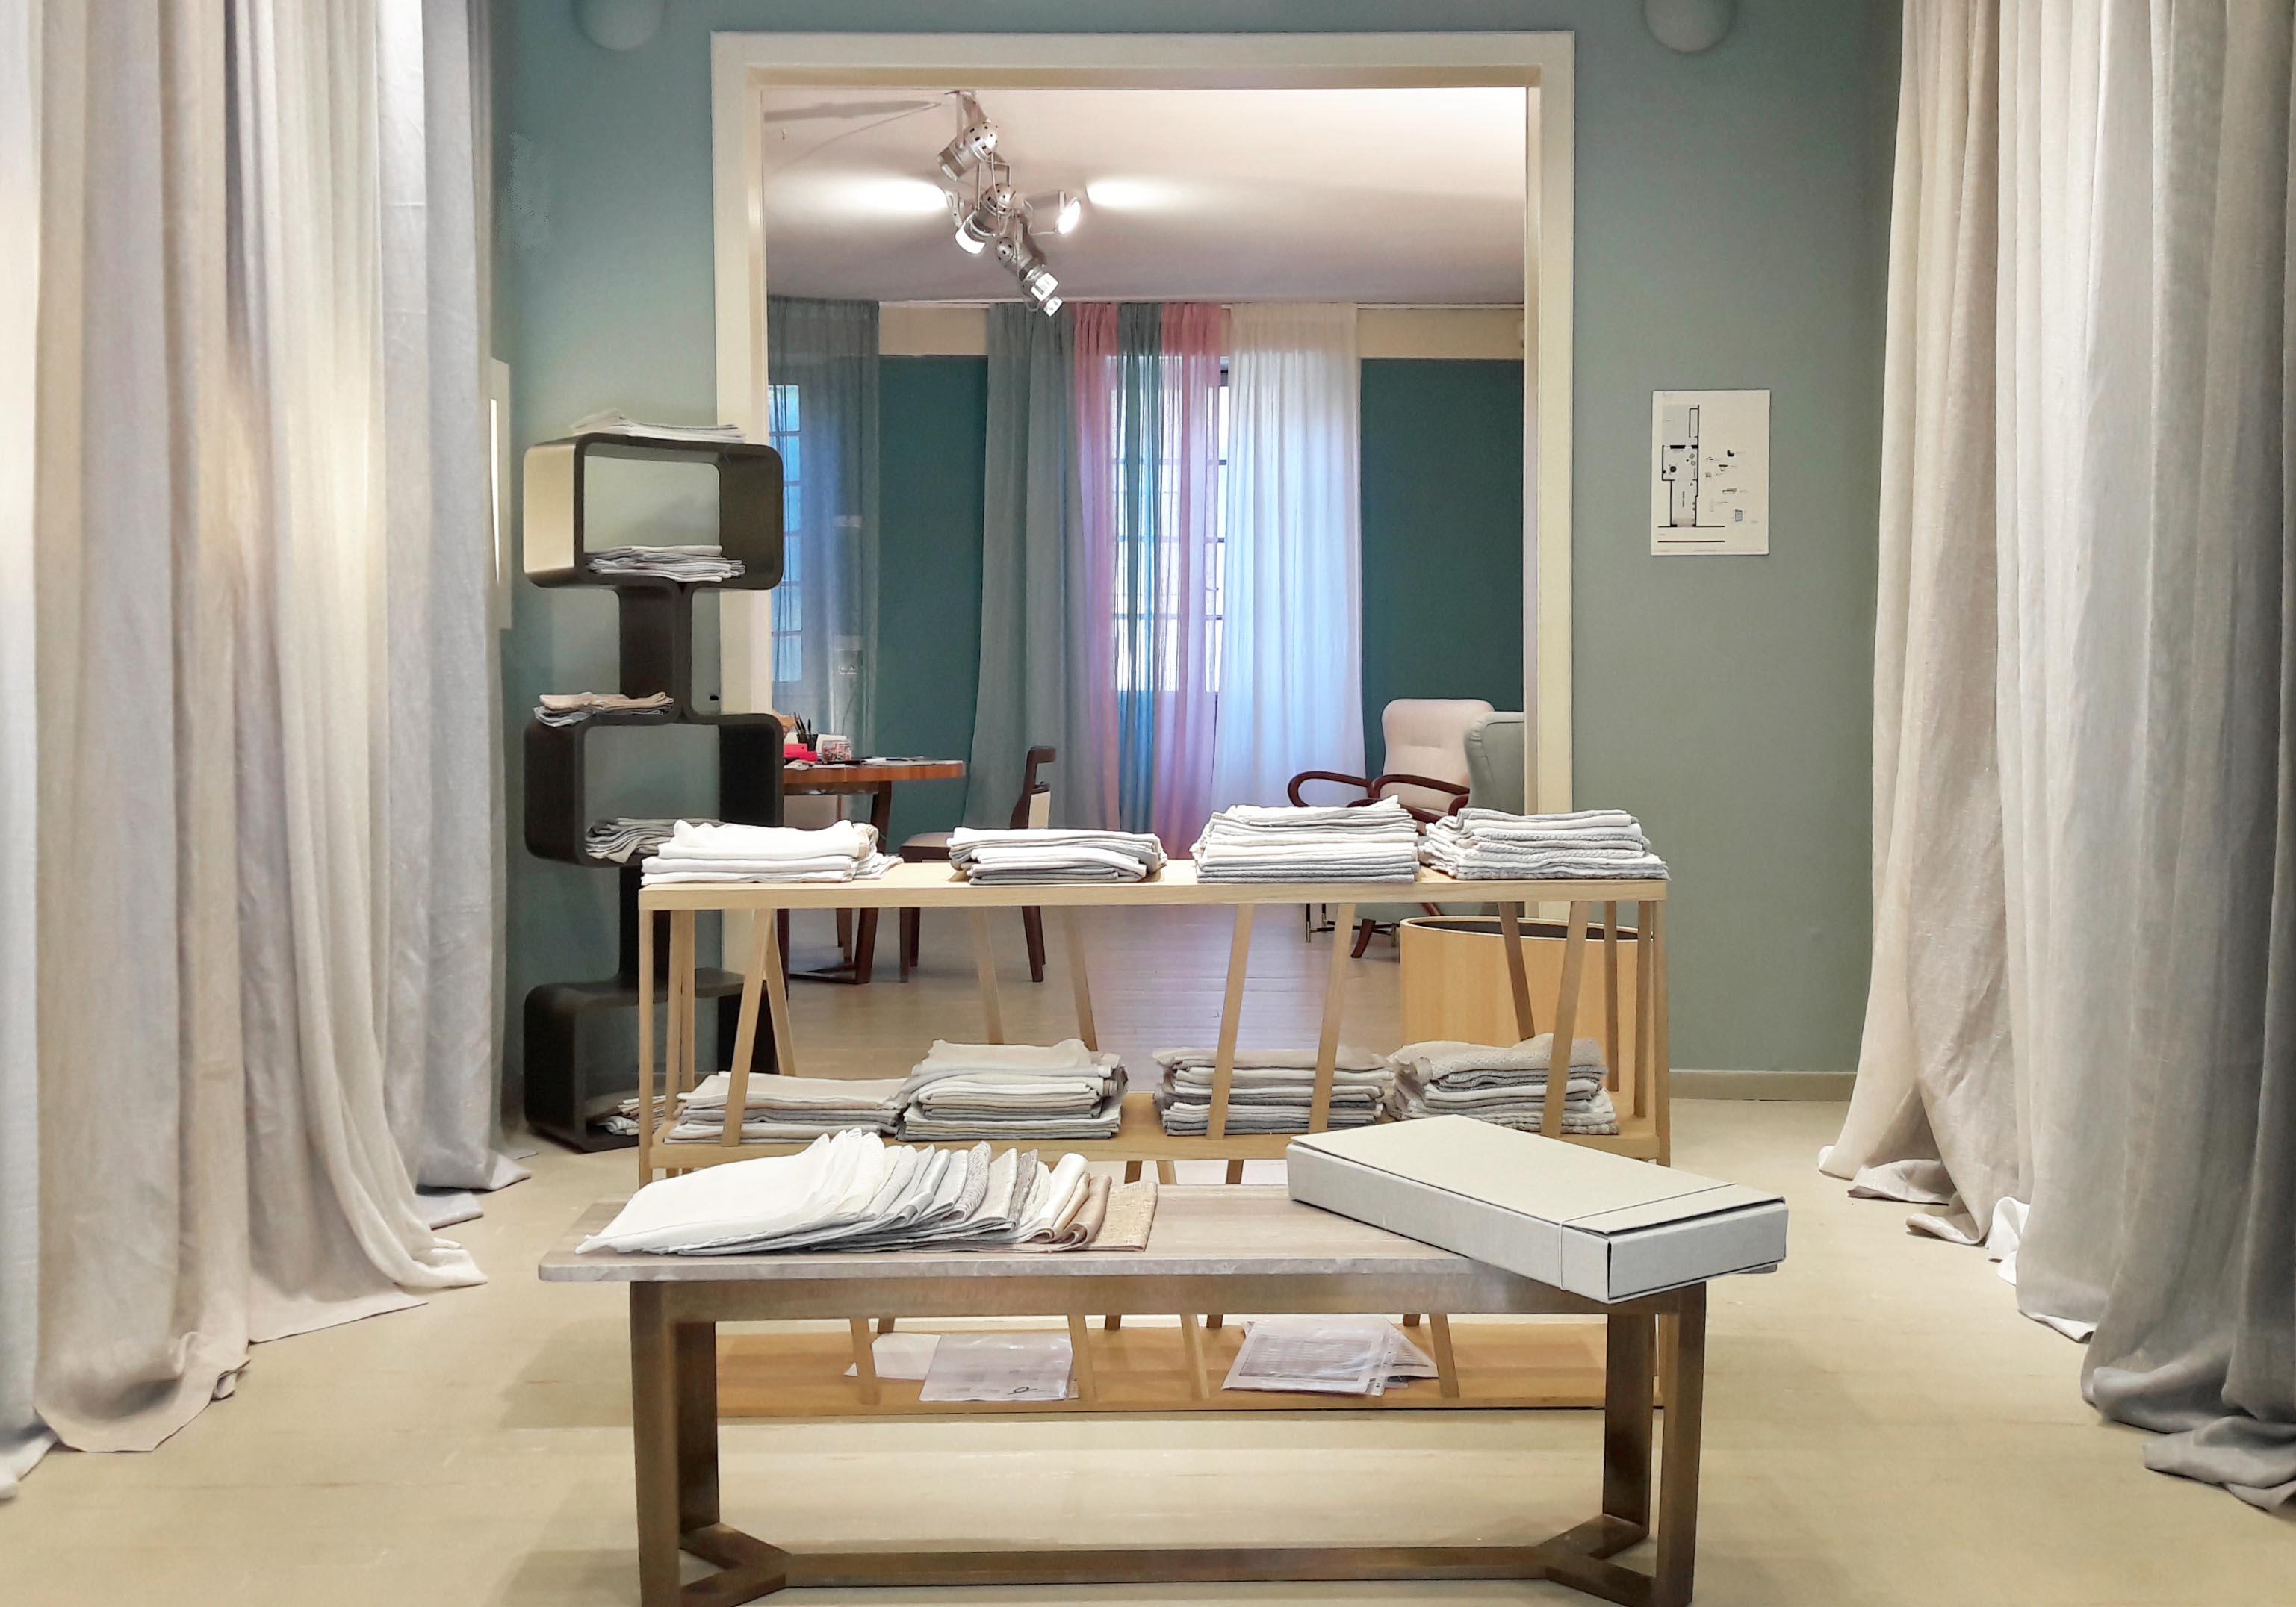 stand-exhibition-interior-fabrics-linen